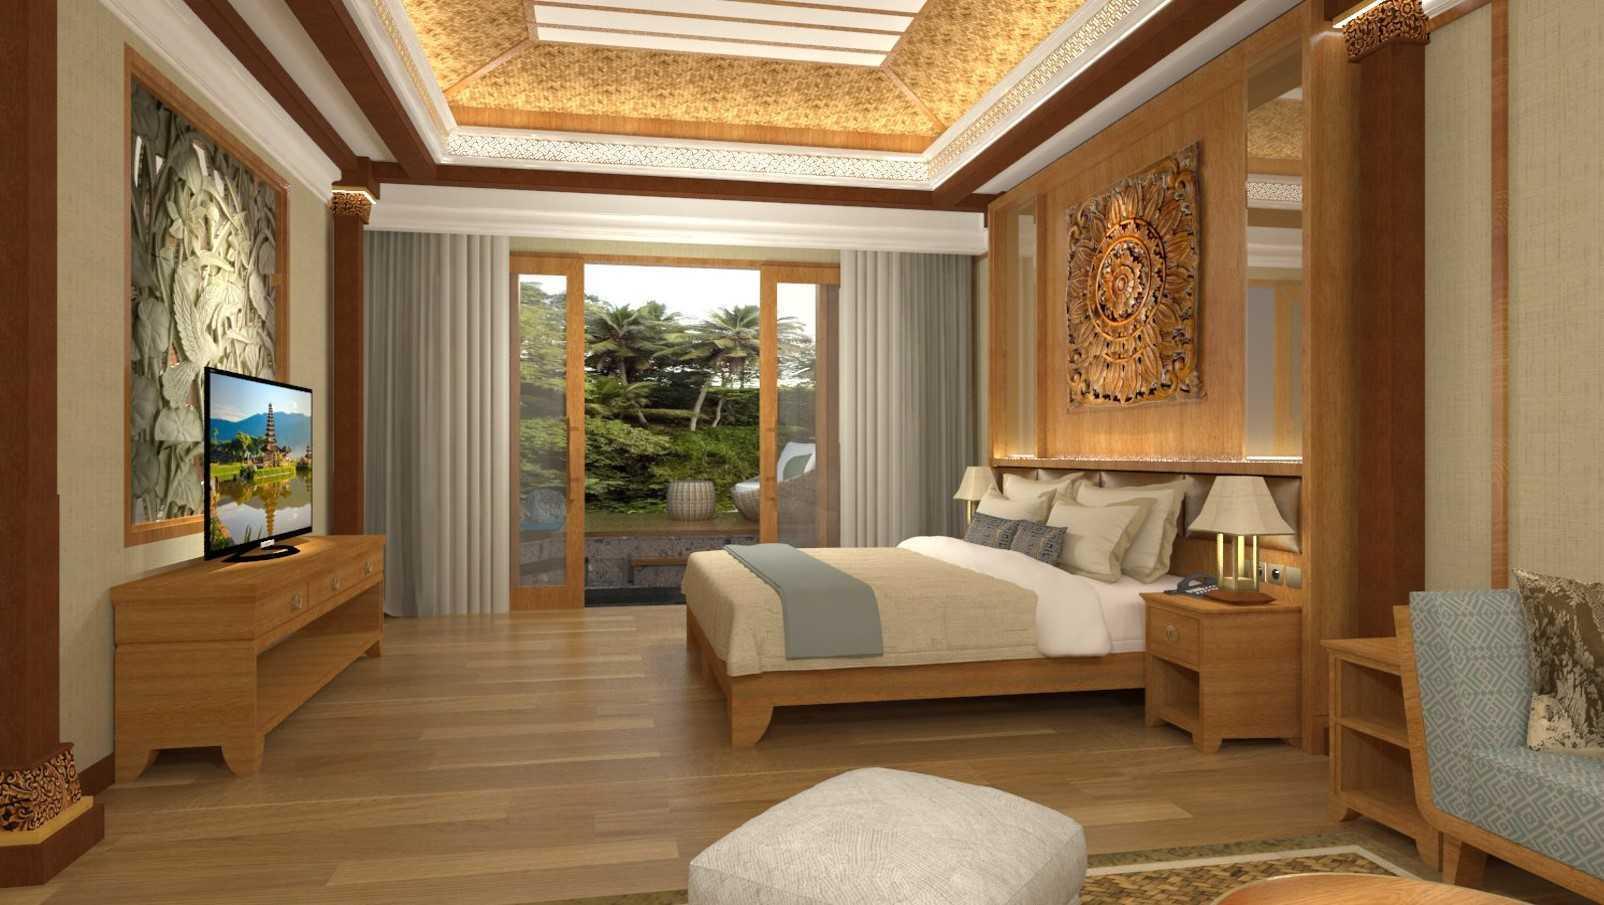 Tms Creative Kristana Hotel – Arts & Culture Resort  Ubud, Bali - Indonesia Ubud, Kecamatan Ubud, Kabupaten Gianyar, Bali, Indonesia Ubud, Kecamatan Ubud, Kabupaten Gianyar, Bali, Indonesia Tms-Creative-Kristana-Hotel-Arts-Culture-Resort-Ubud-Bali-Indonesia   103790